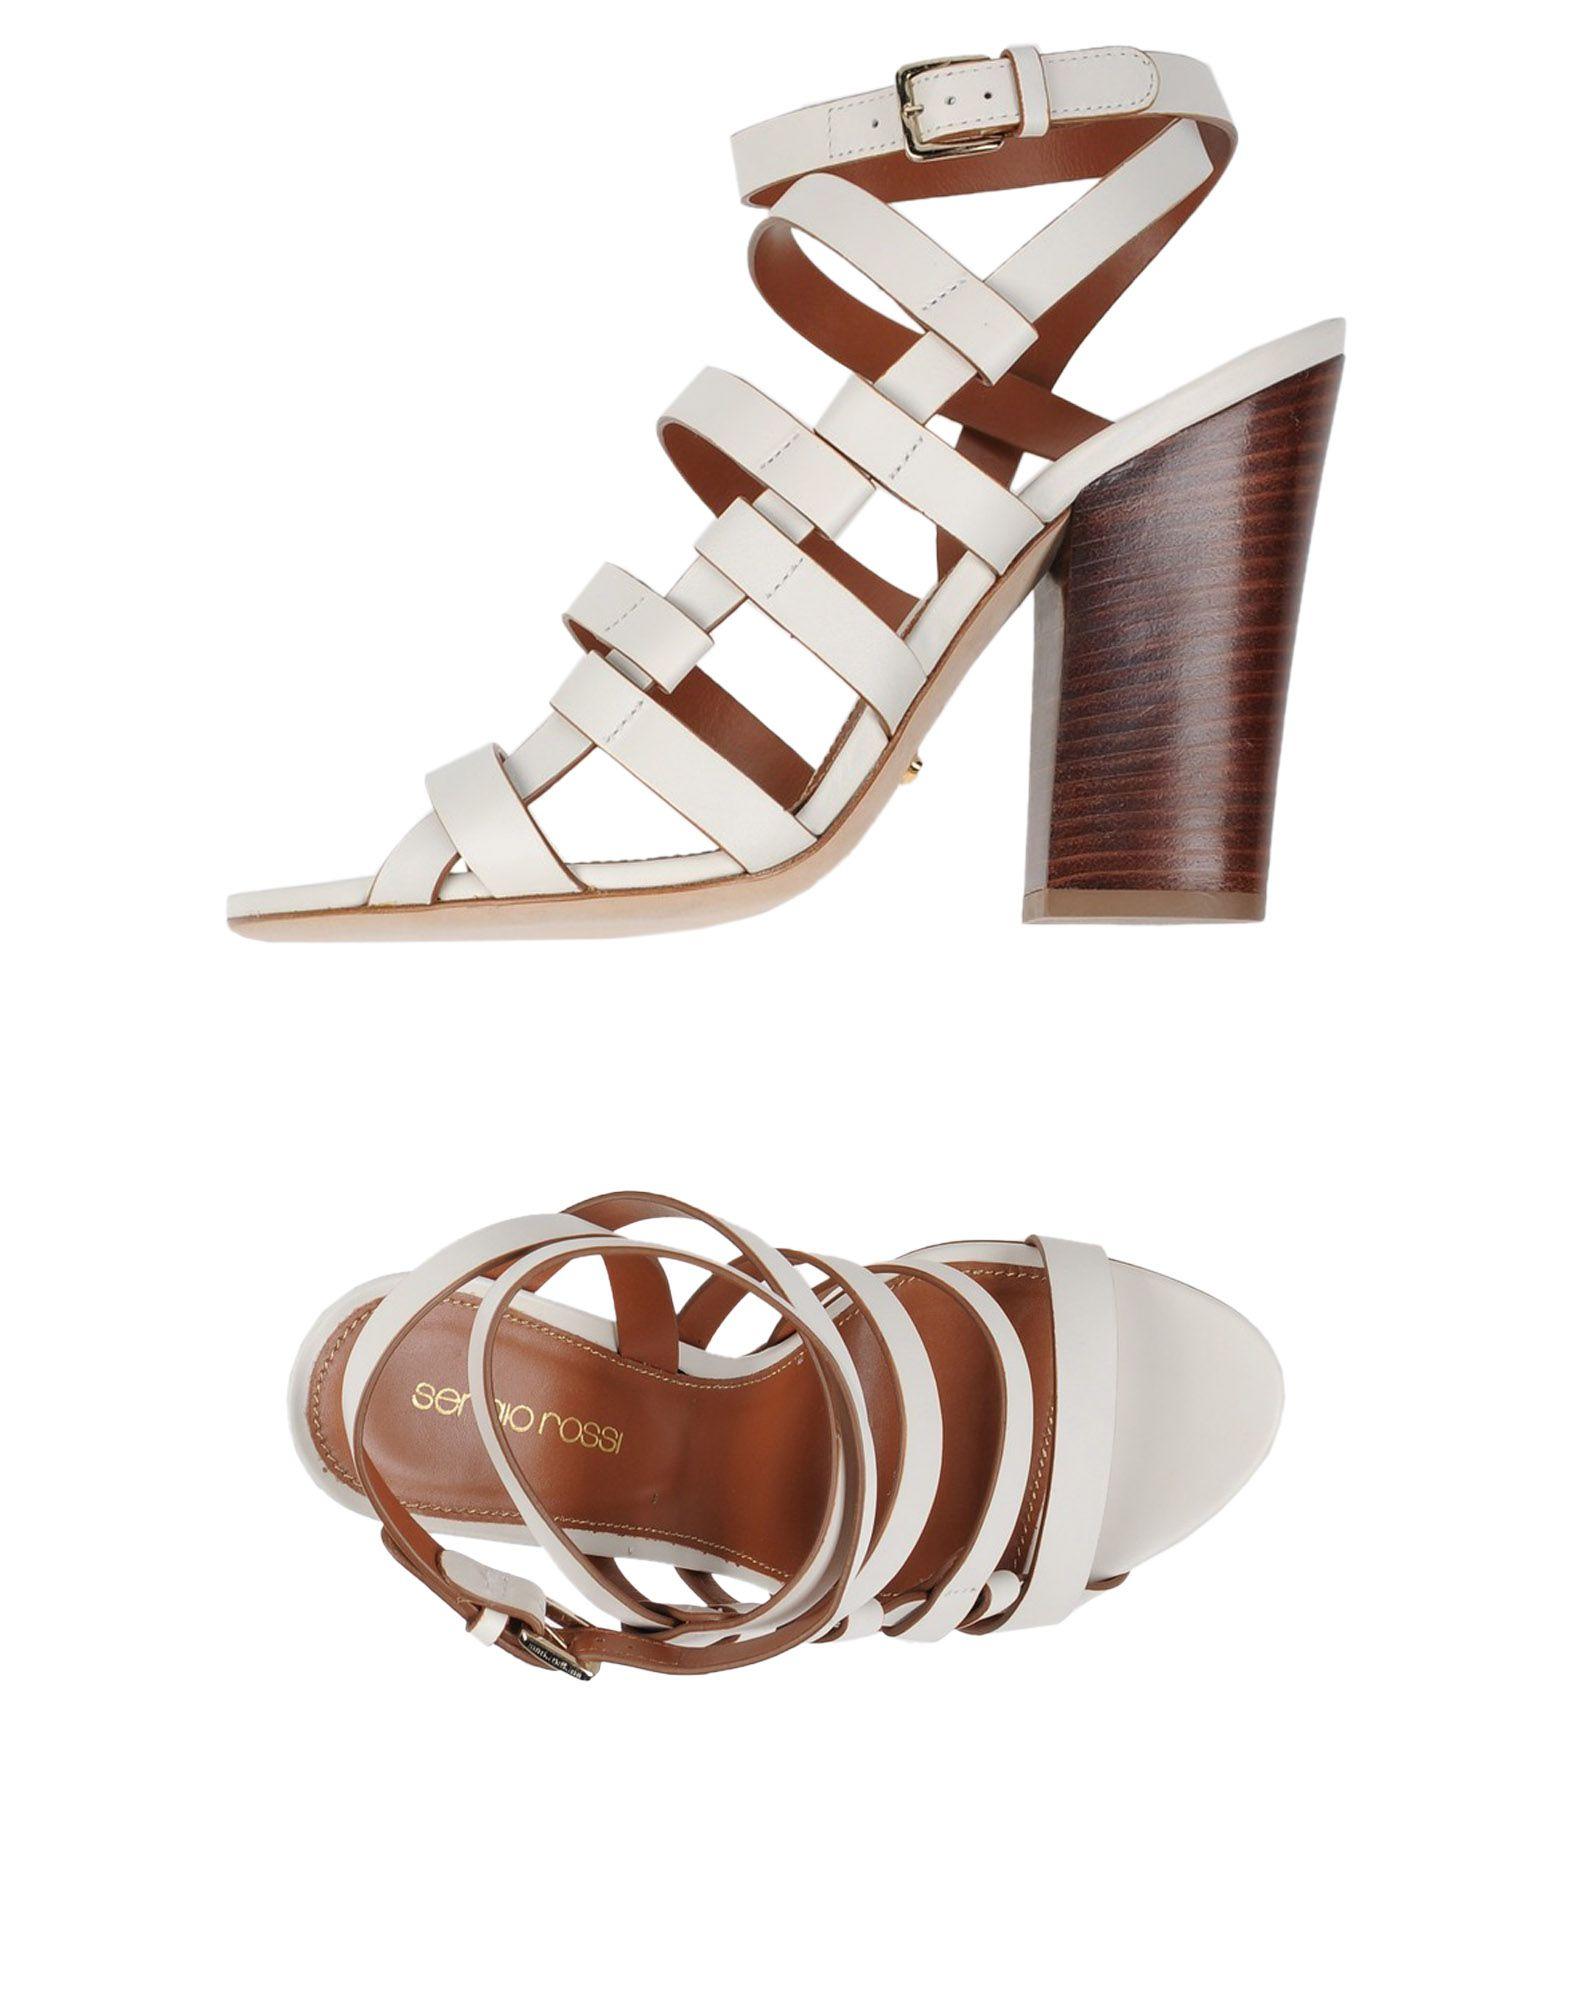 Sergio Rossi Sandals - Women Women Women Sergio Rossi Sandals online on  United Kingdom - 11411808TI 2d0749